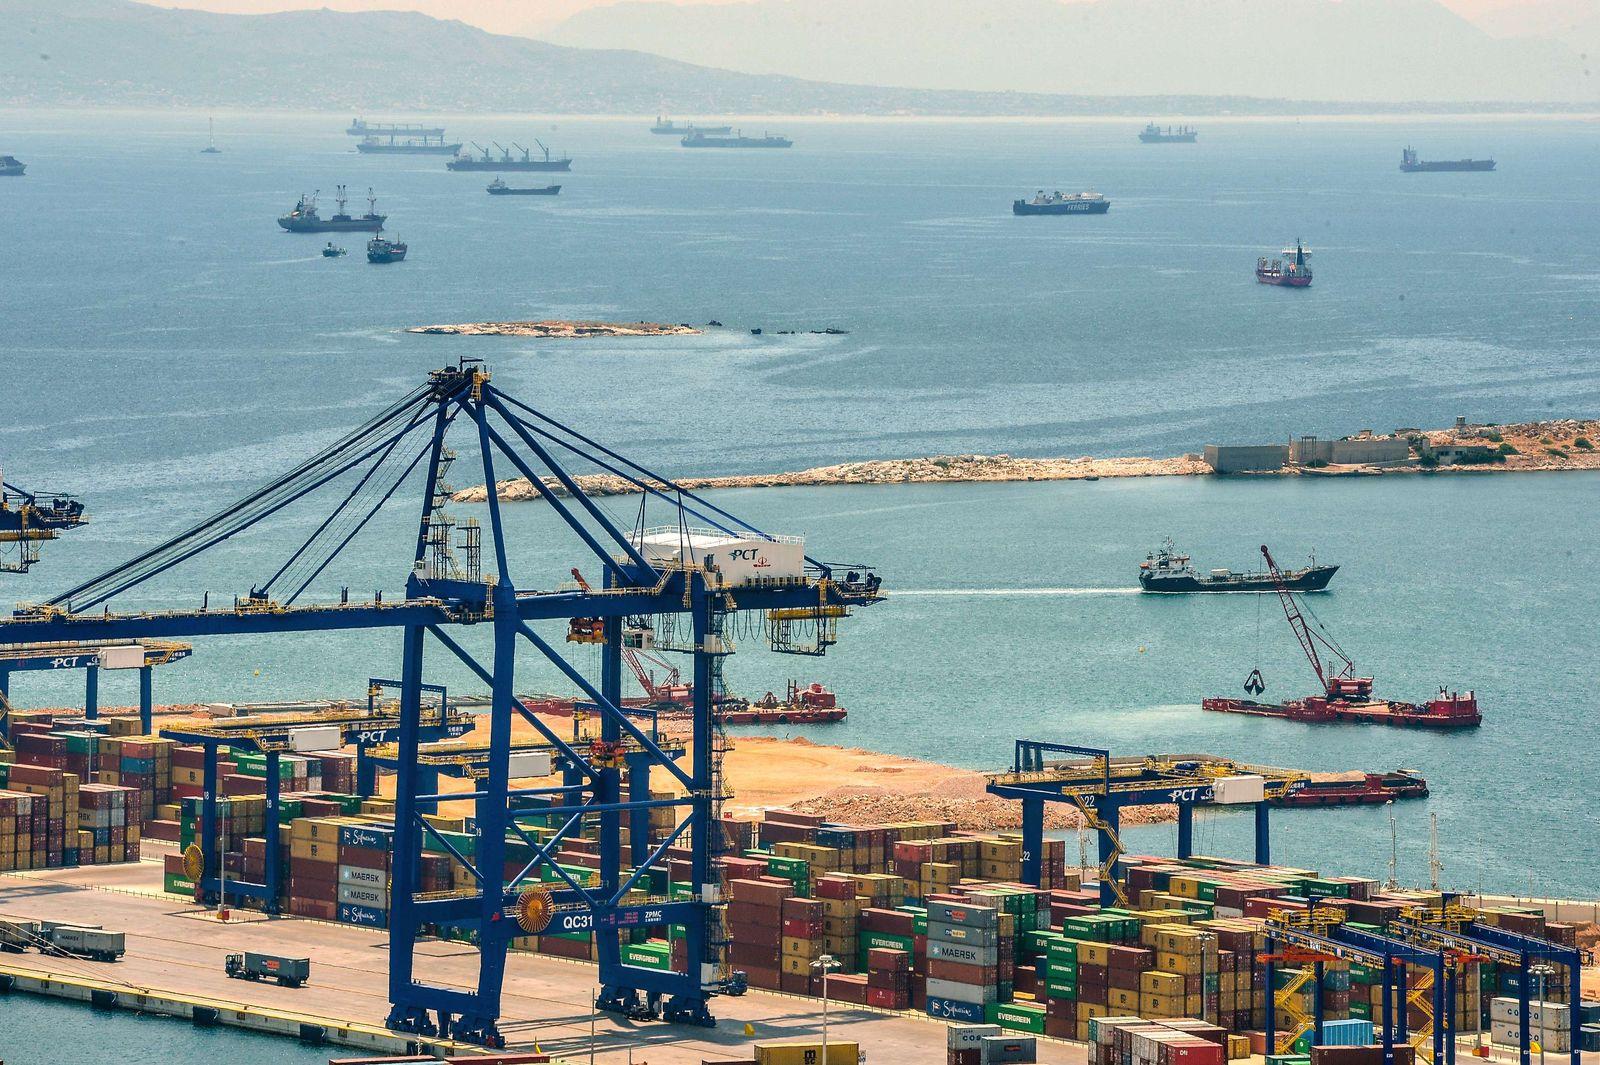 Griechenland / Finanzkrise / Konjunktur / Export / Import / Hafen